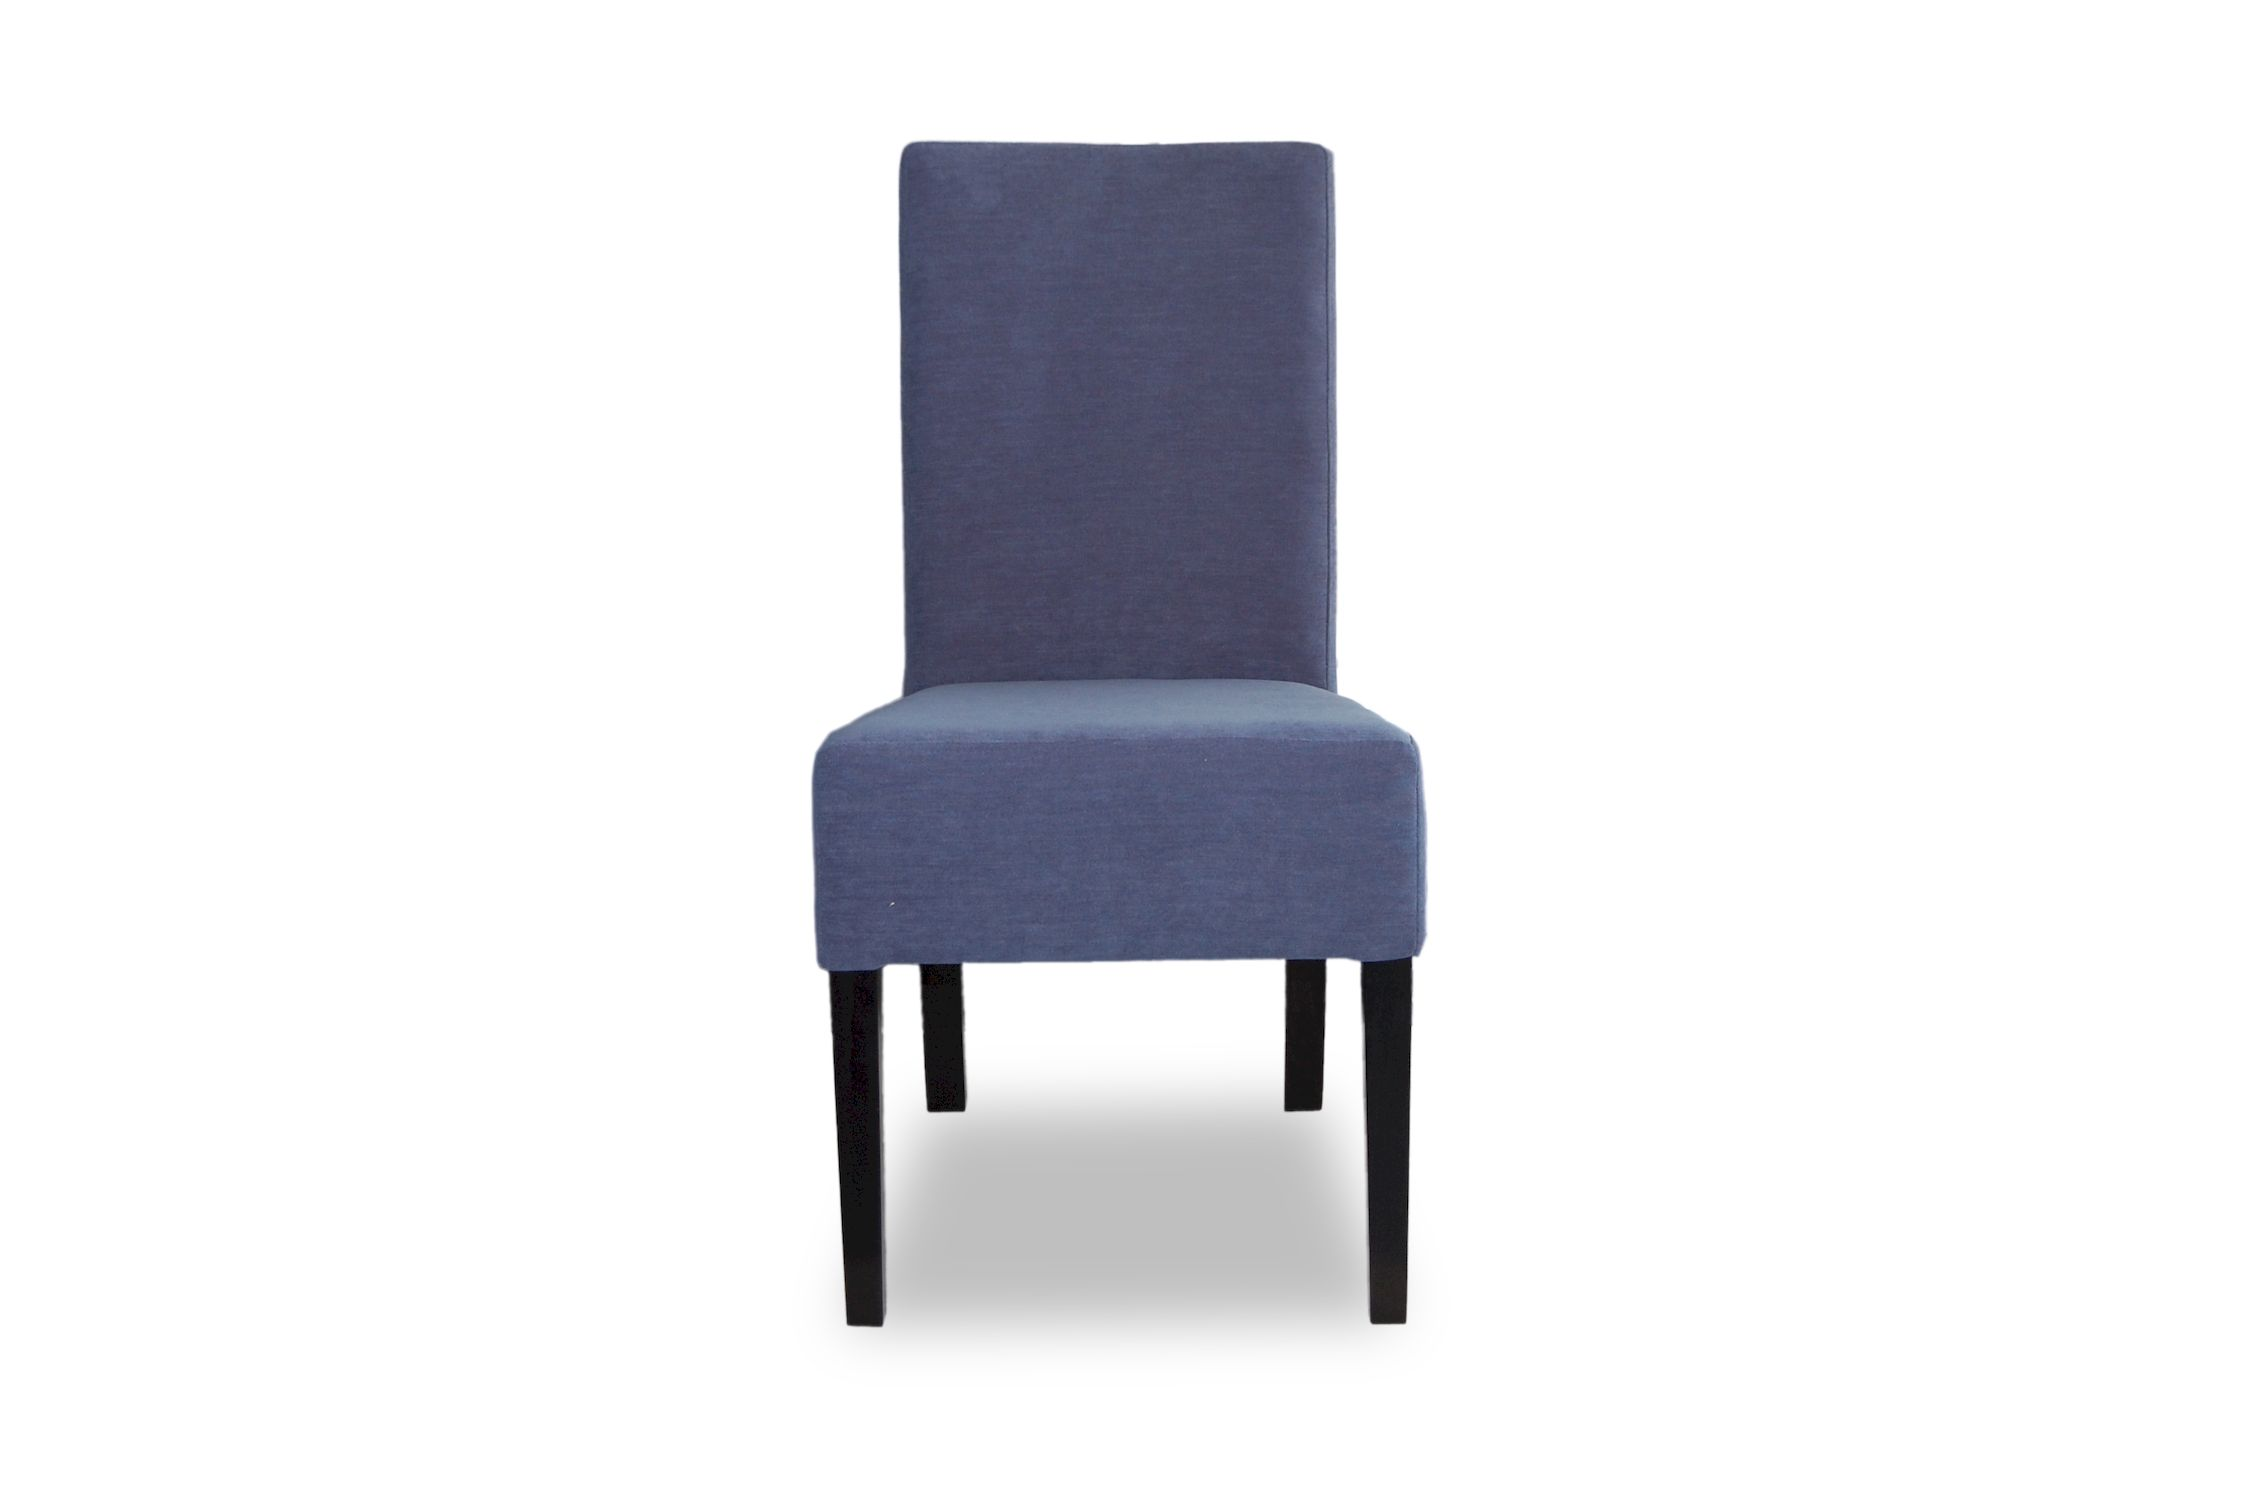 Židle Maralyn - různé barvy